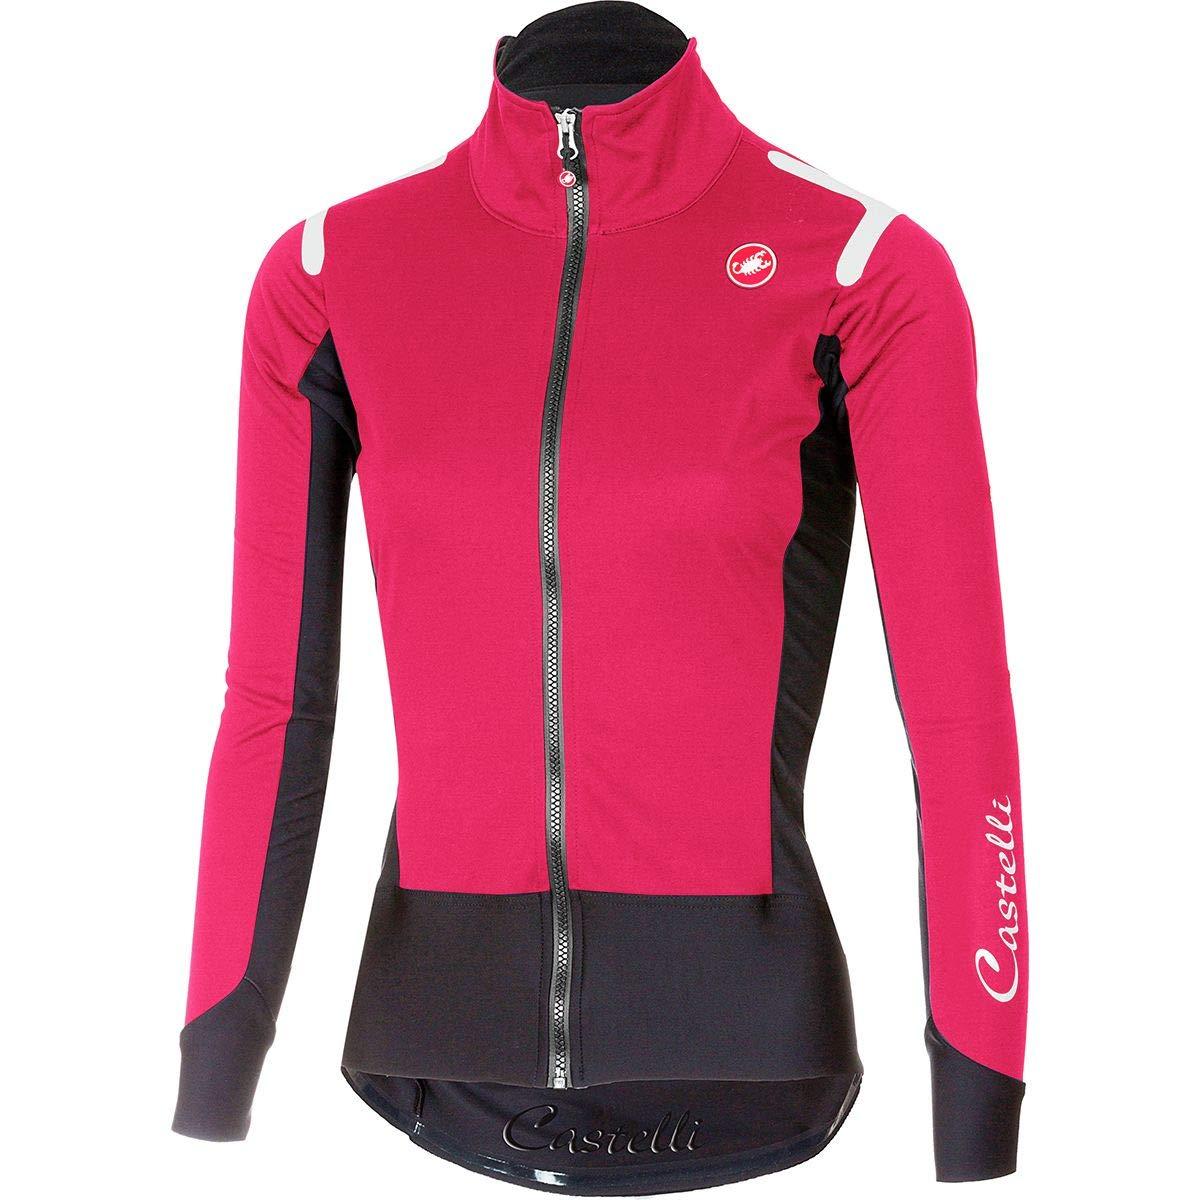 Castelli Alpha ROS Long-Sleeve Jersey - Women's Electric Magenta/Black, XS